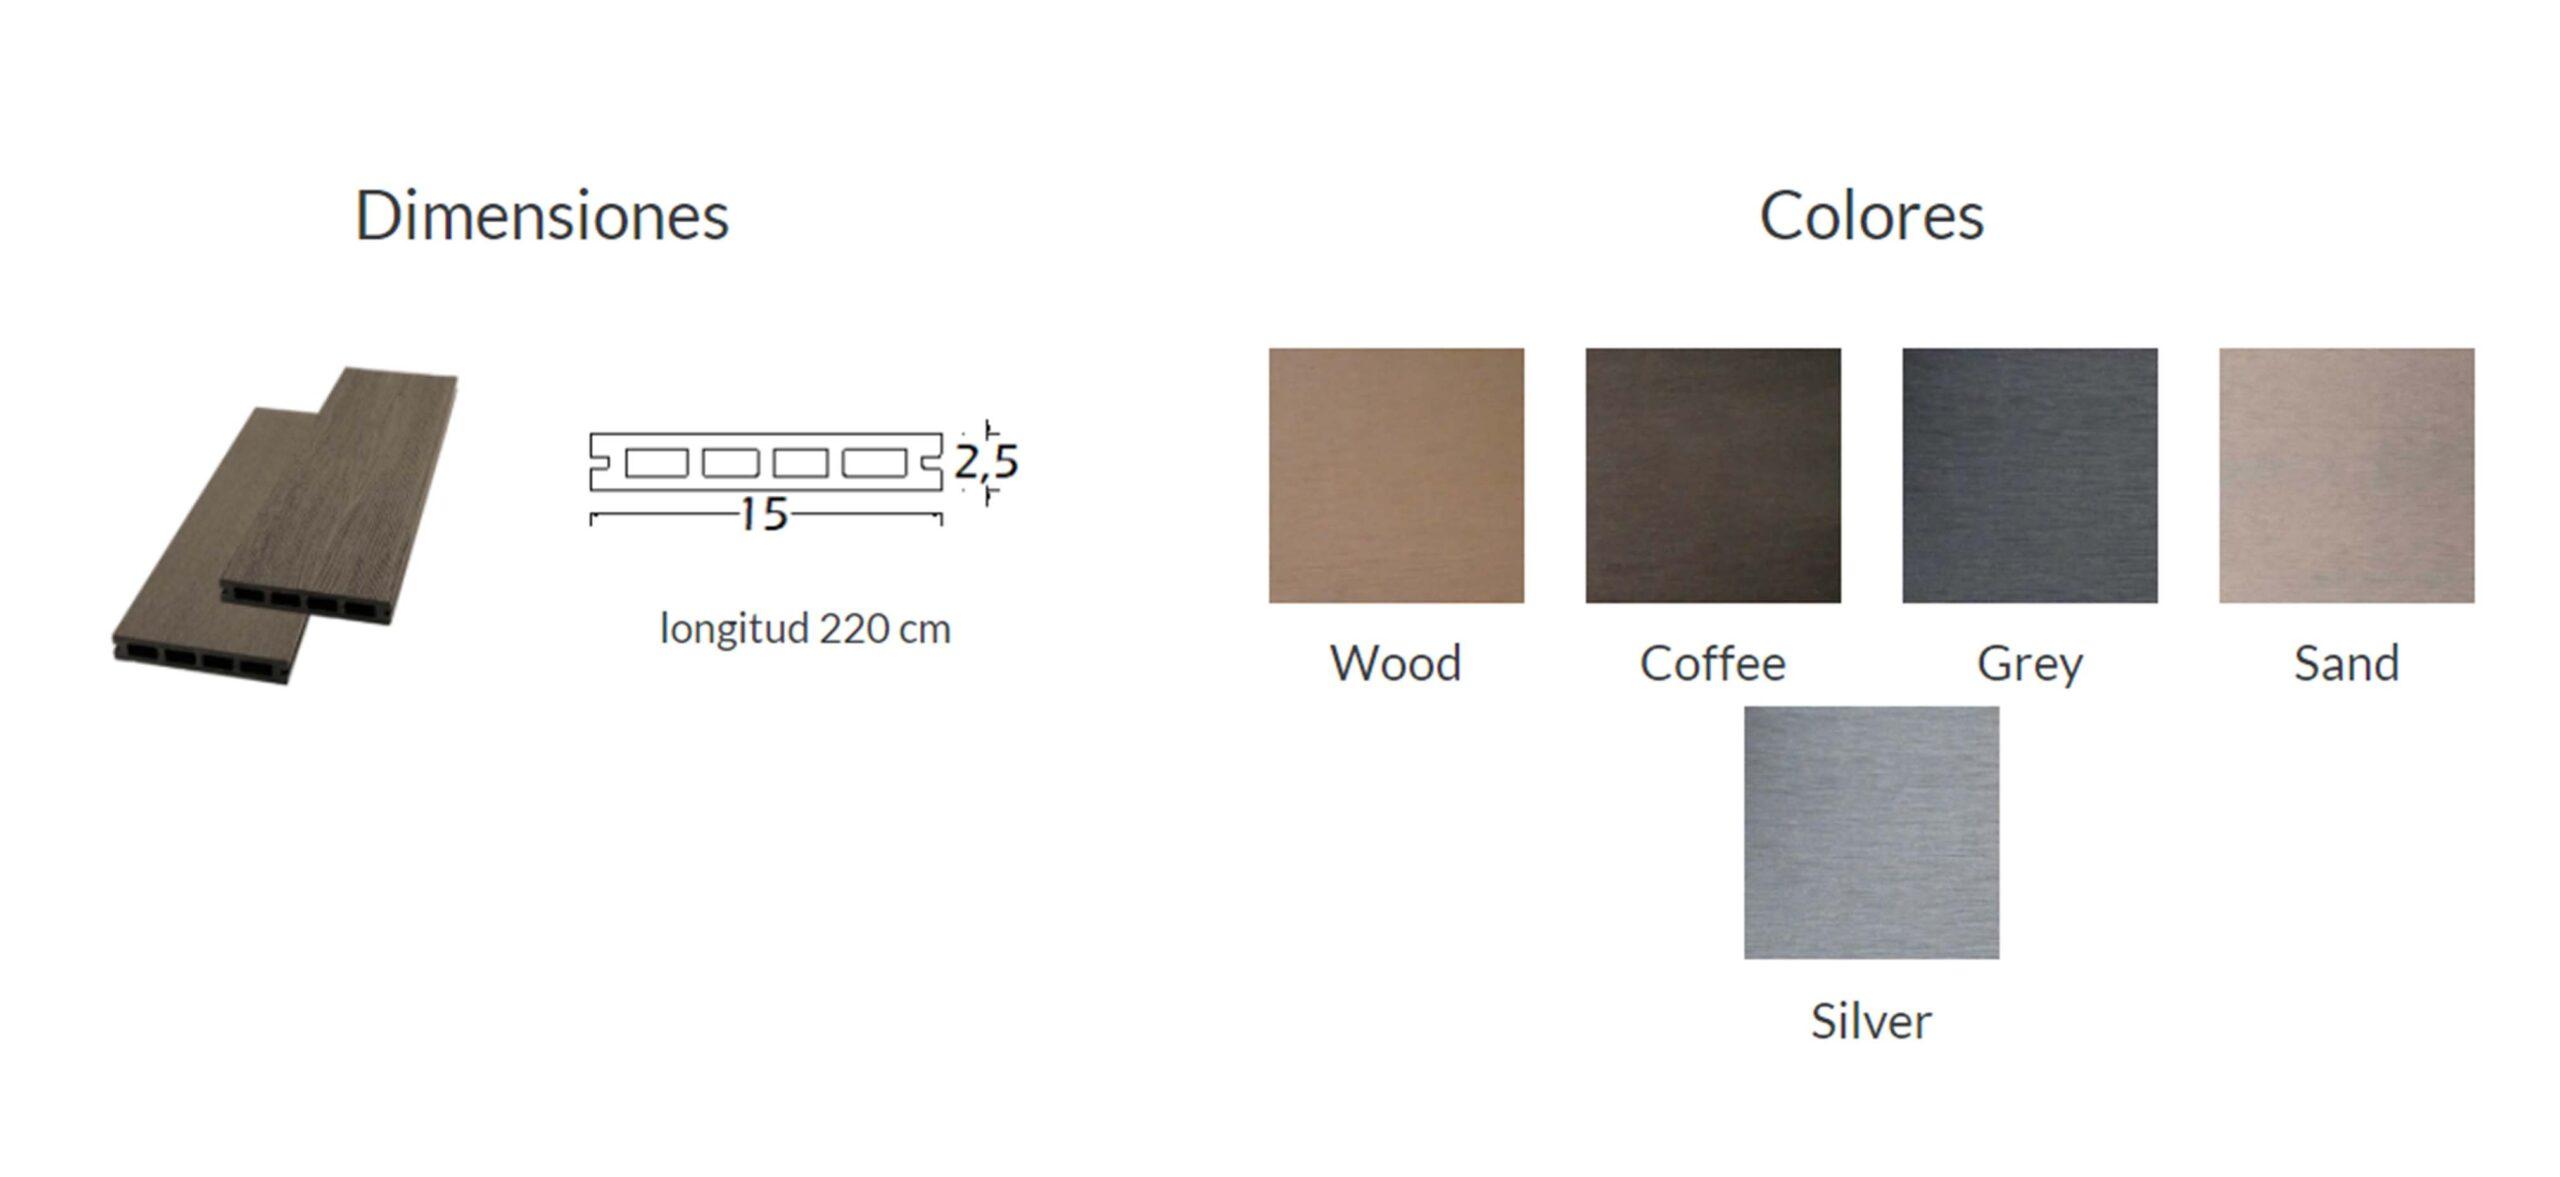 colores vallas composite c5 ibiza 4 002